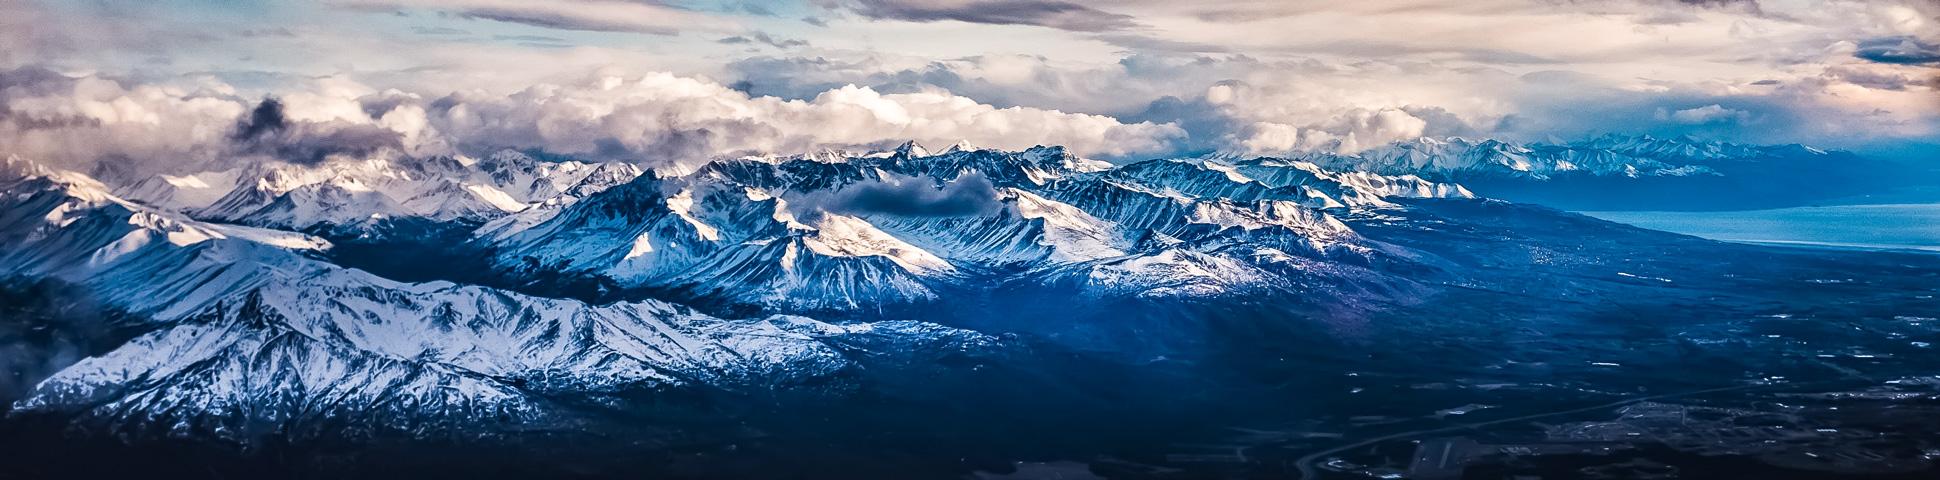 Panoramic view from Alaska's Kenai Peninsula Hiking Tour